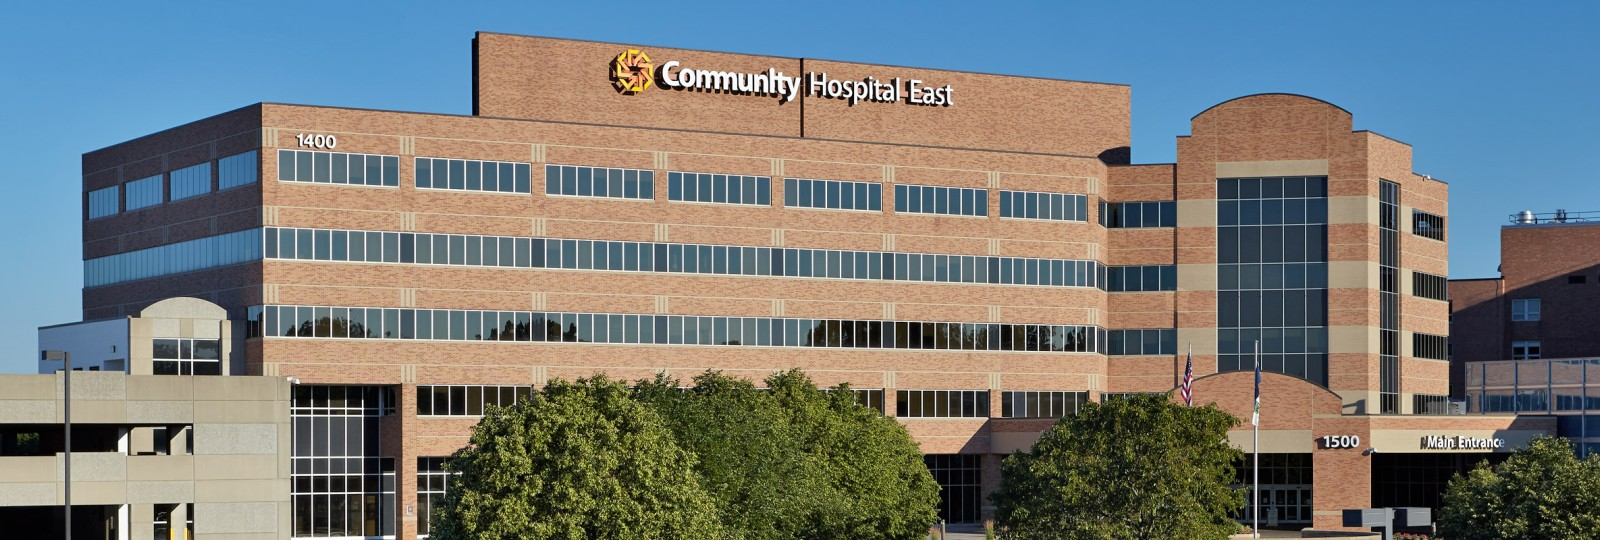 Community Hospital East Community Health Network